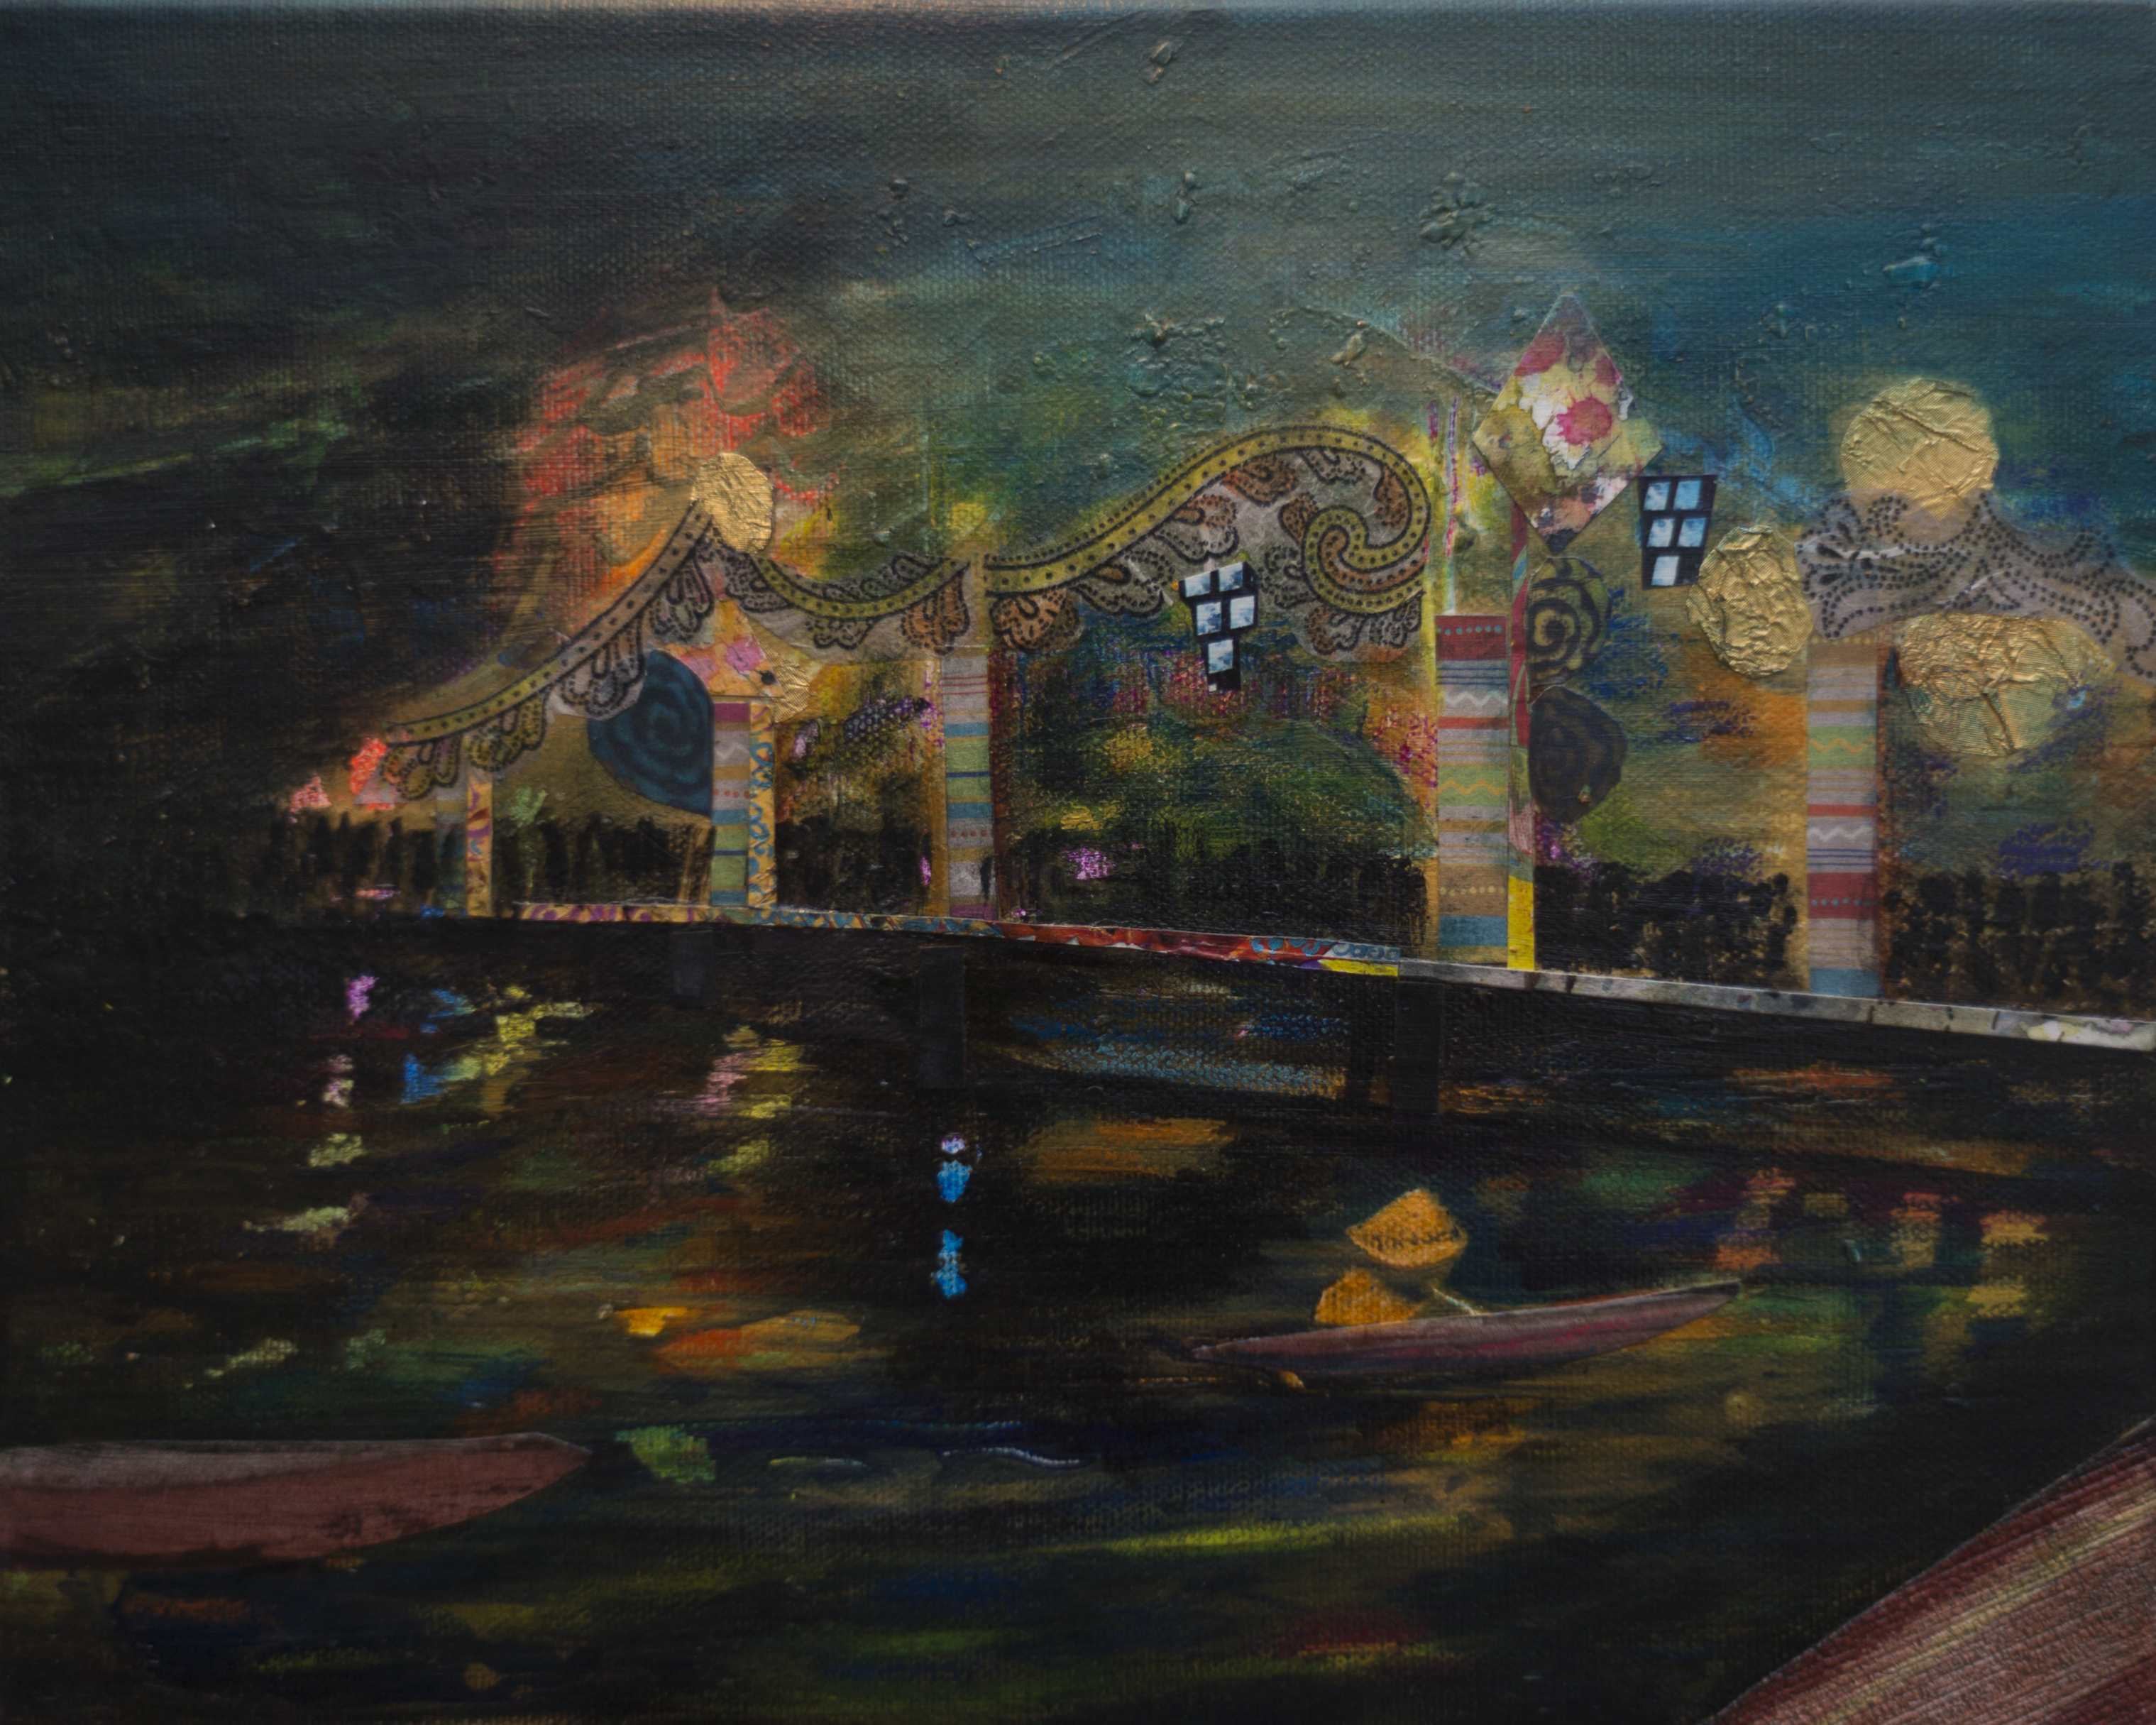 Brigde Hoi An, 2013, Mixed Media LW, 30x20cm